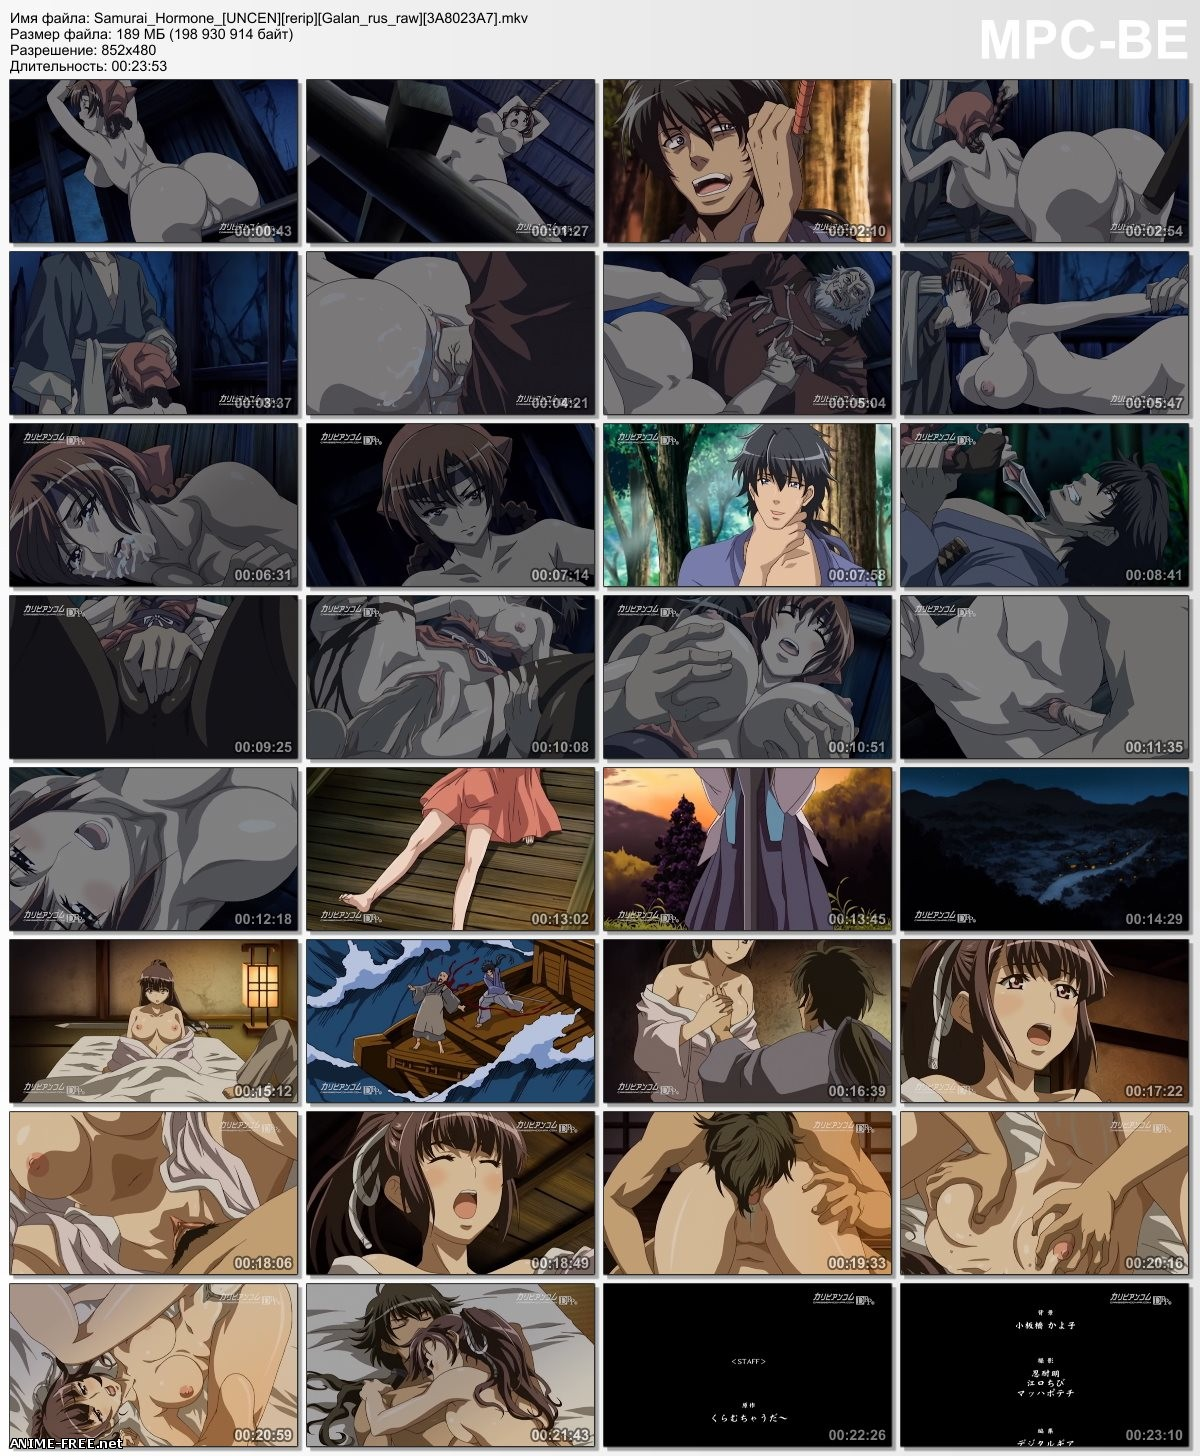 Samurai Hormone The Animation / Самурай Гормон [Ep.1] [RUS,ENG,JAP] Anime Hentai